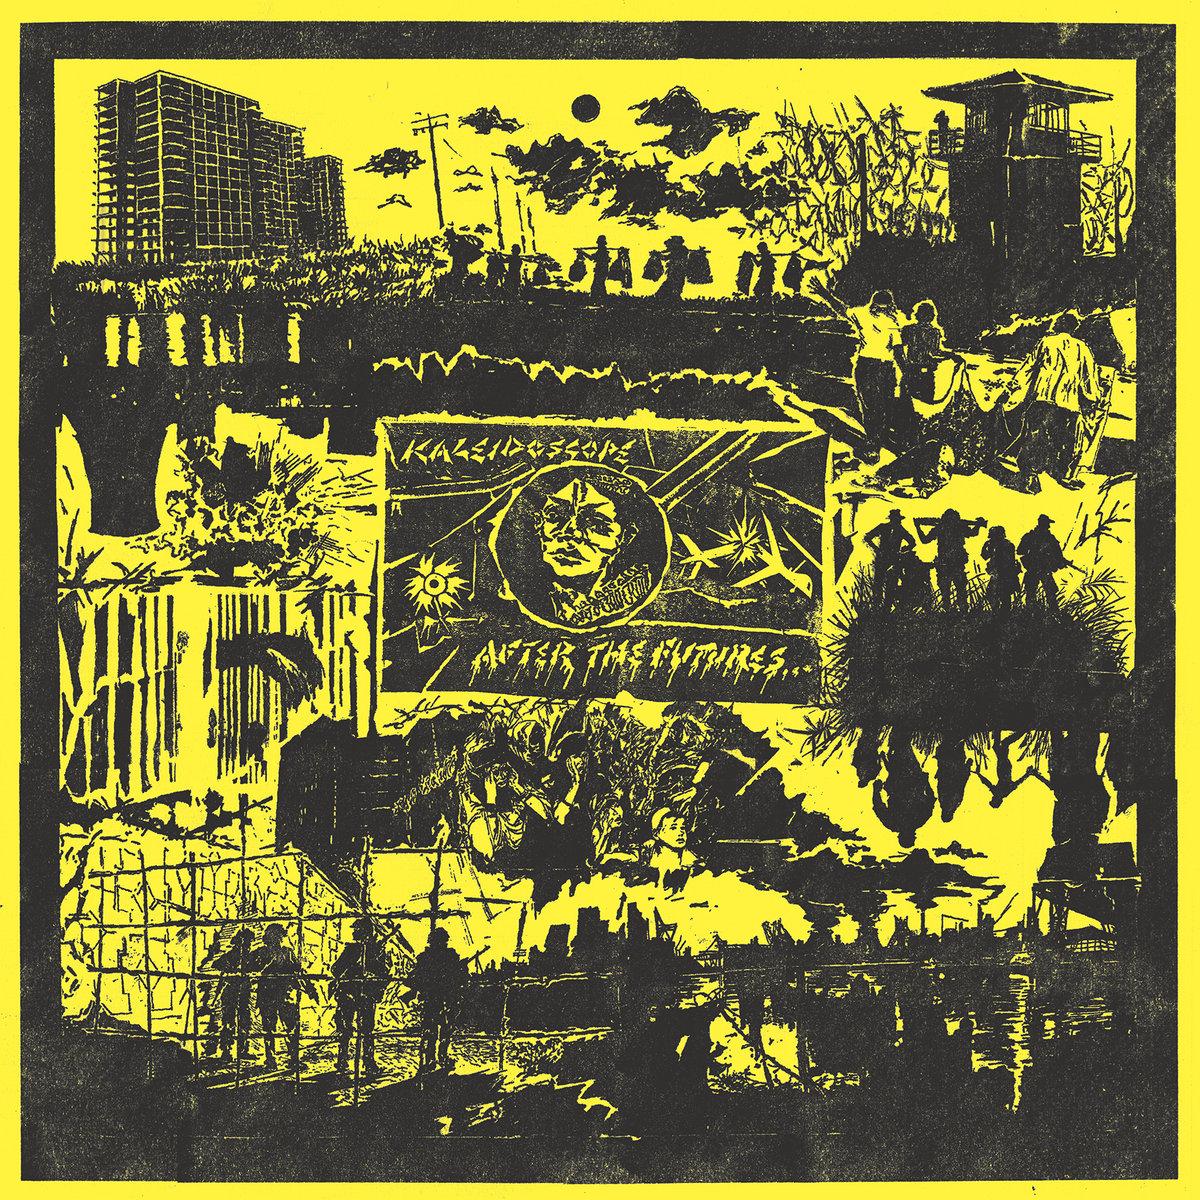 Kaleidoscope - After The Futures LP